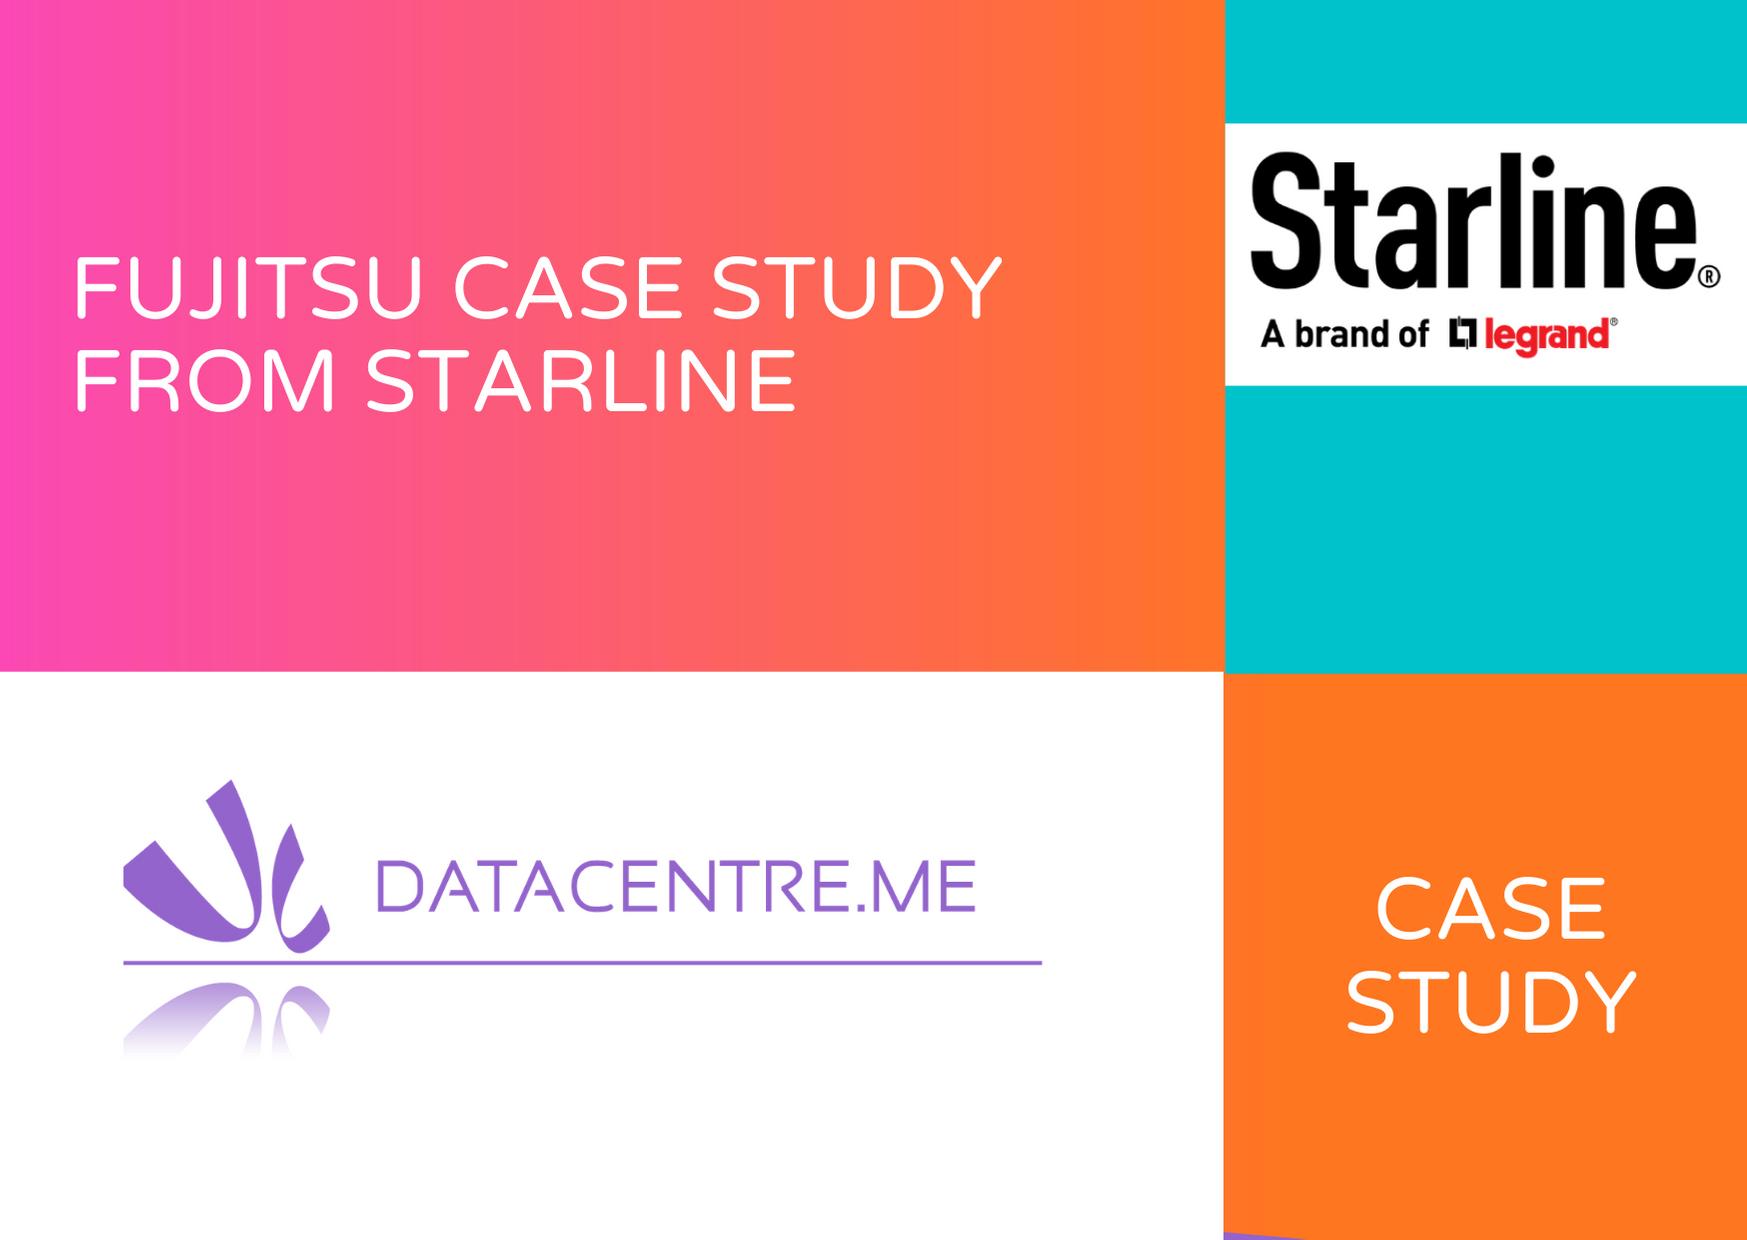 Starline Case Study on DATACENTRE.ME